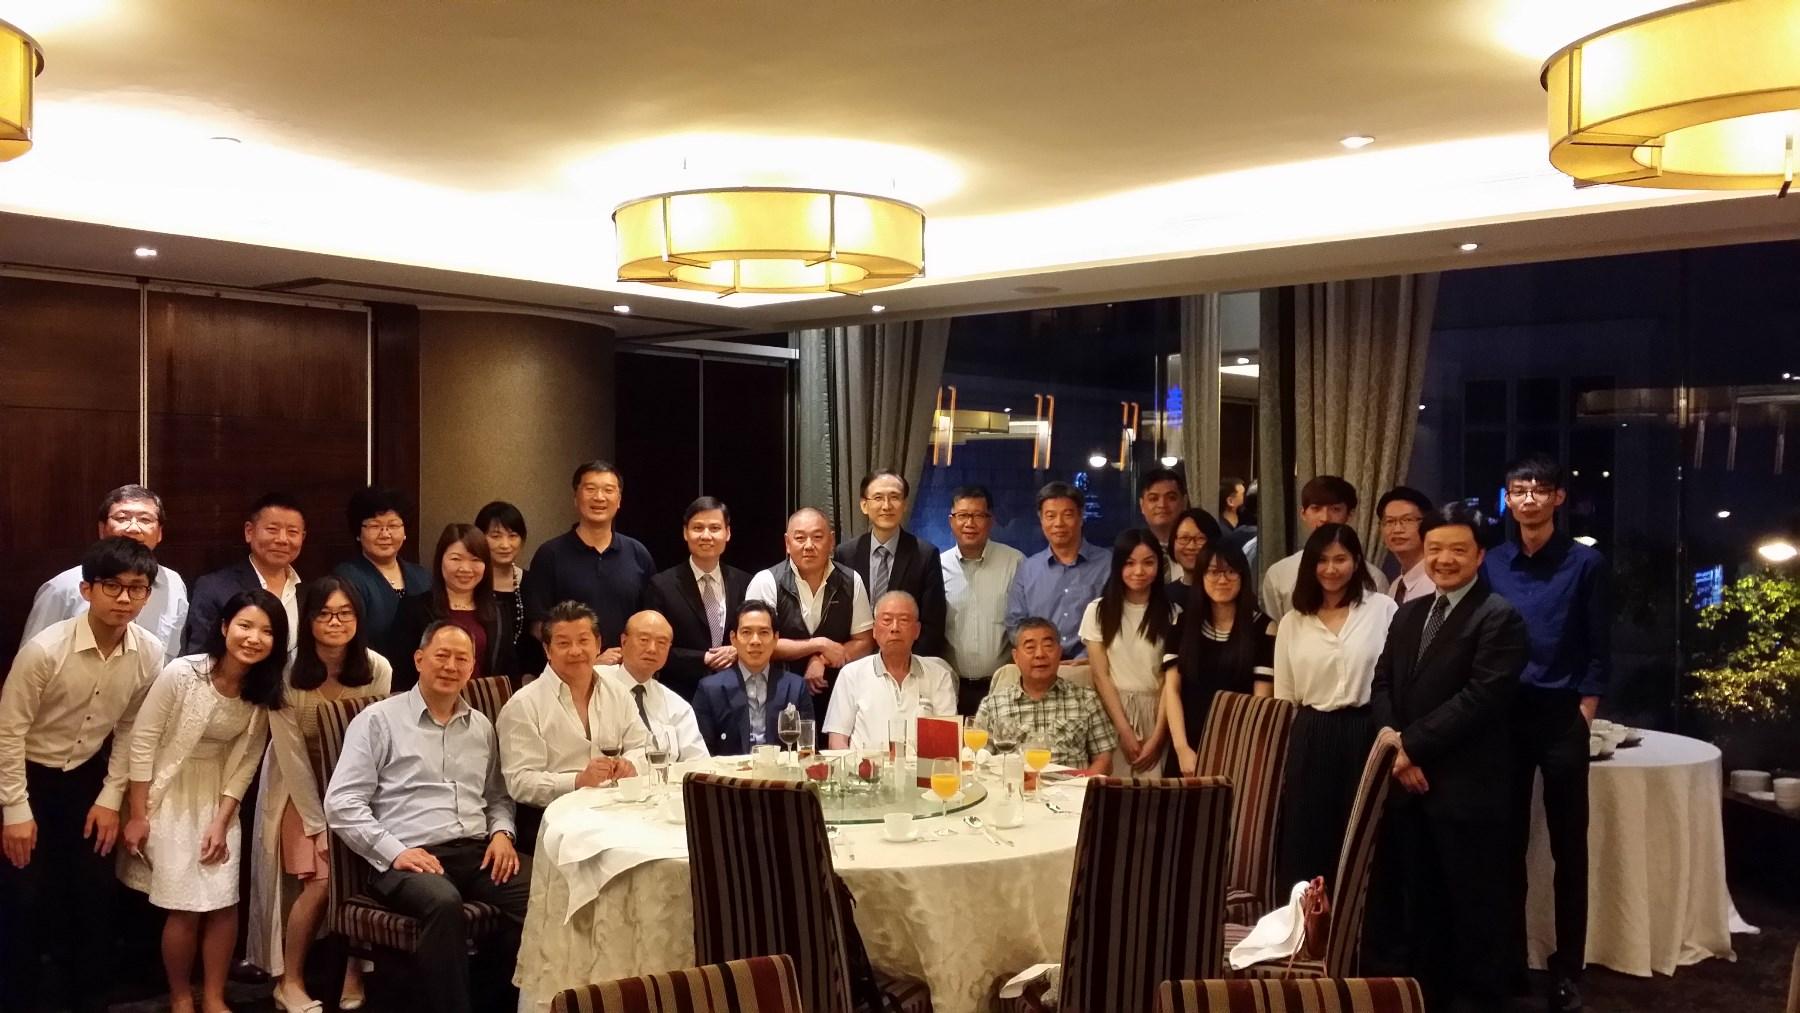 http://www.npc.edu.hk/sites/default/files/20170622_211351.jpg